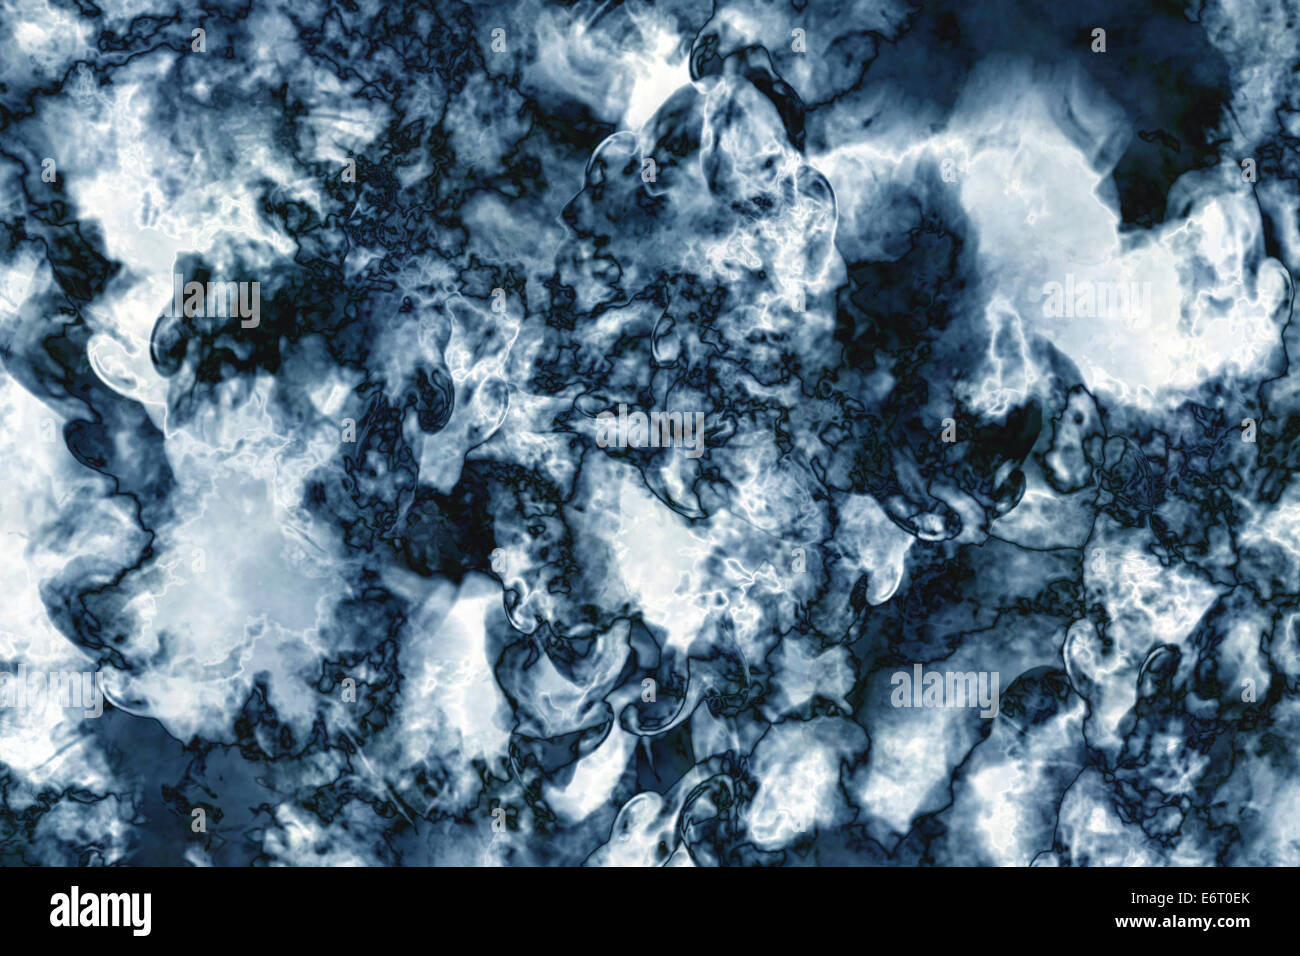 Fantastic Wallpaper Marble Dark Blue - blue-marble-texture-background-abstract-background-for-design-colored-E6T0EK  Image_394859.jpg